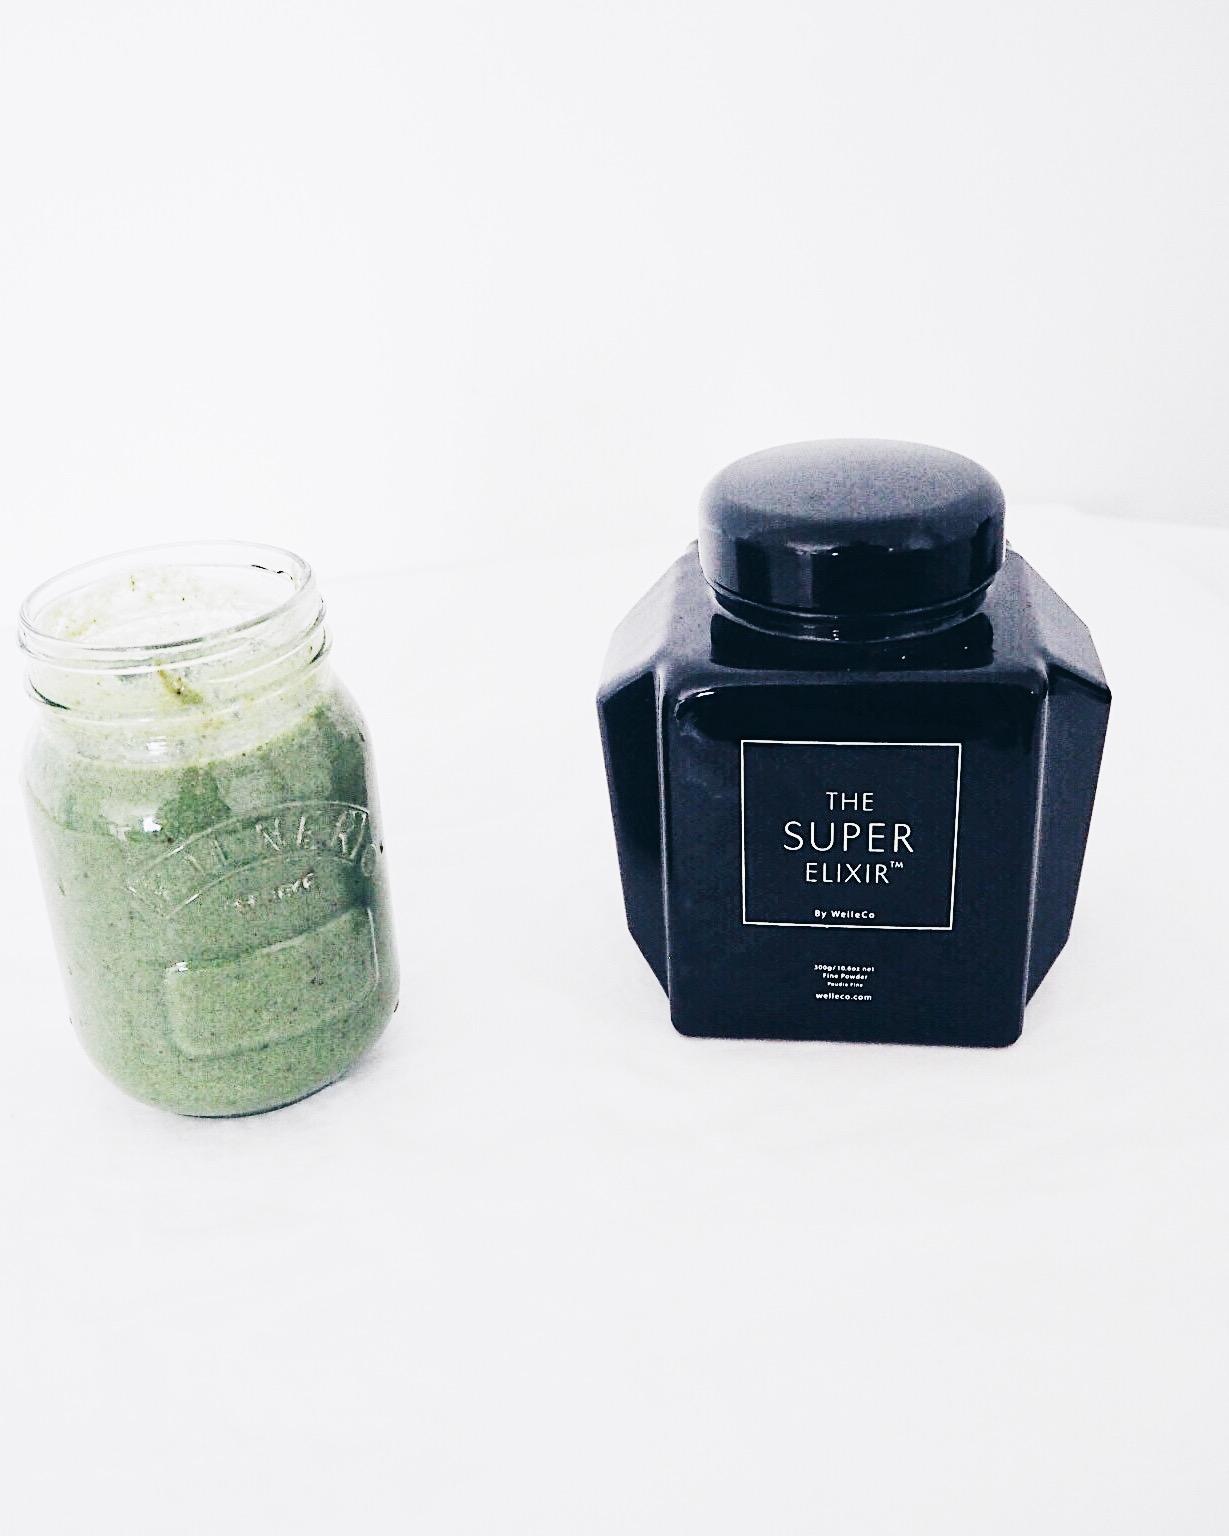 Super Elixir smoothie